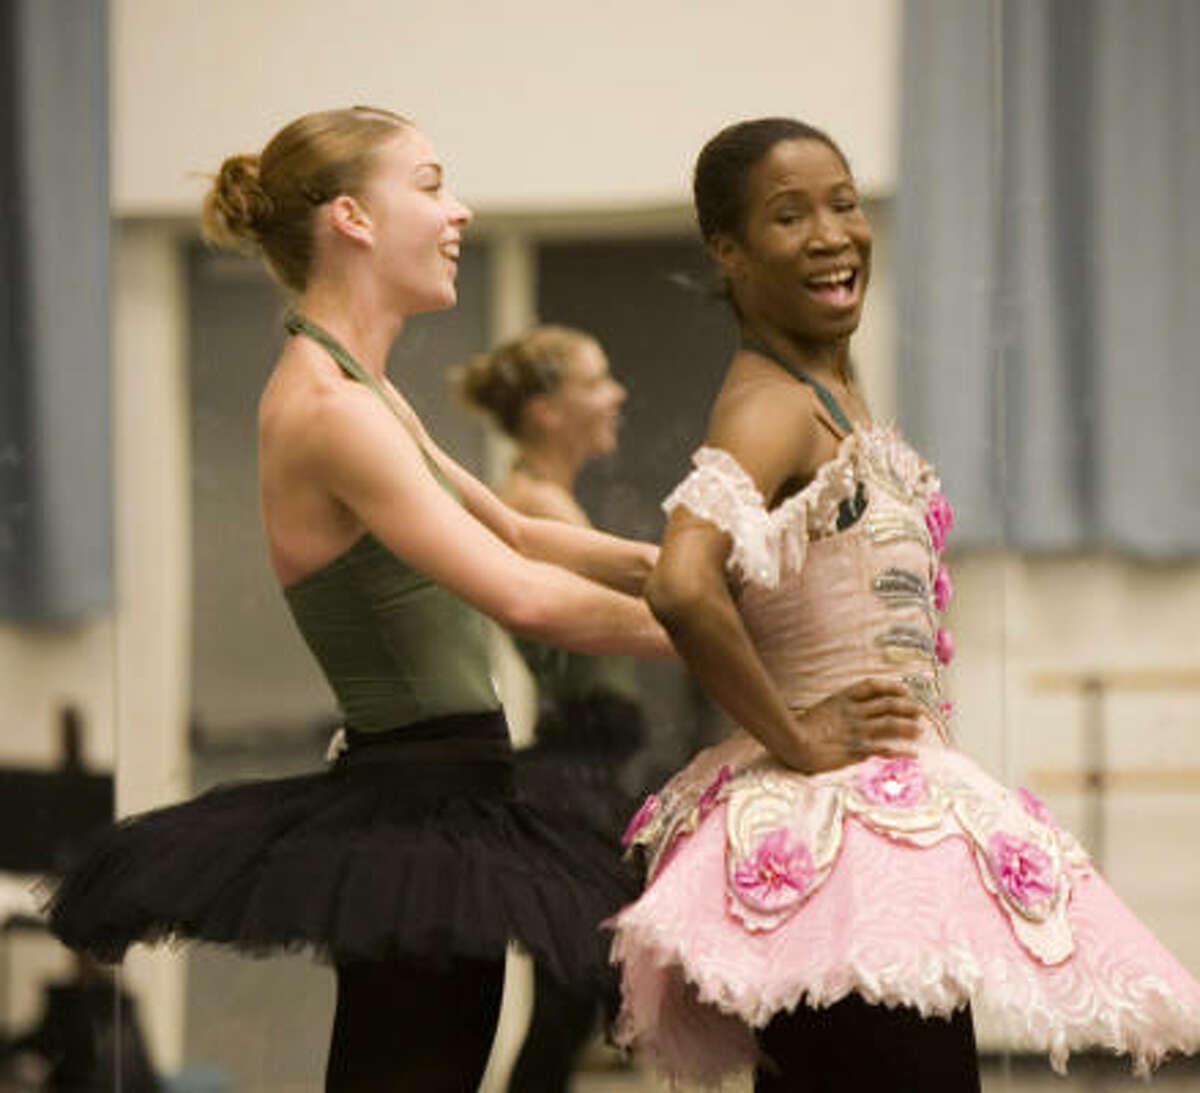 GOOD TIMES: Houston Ballet principal dancer Lauren Anderson laughs as dancer Jaquel Andrews helps her with her costume.